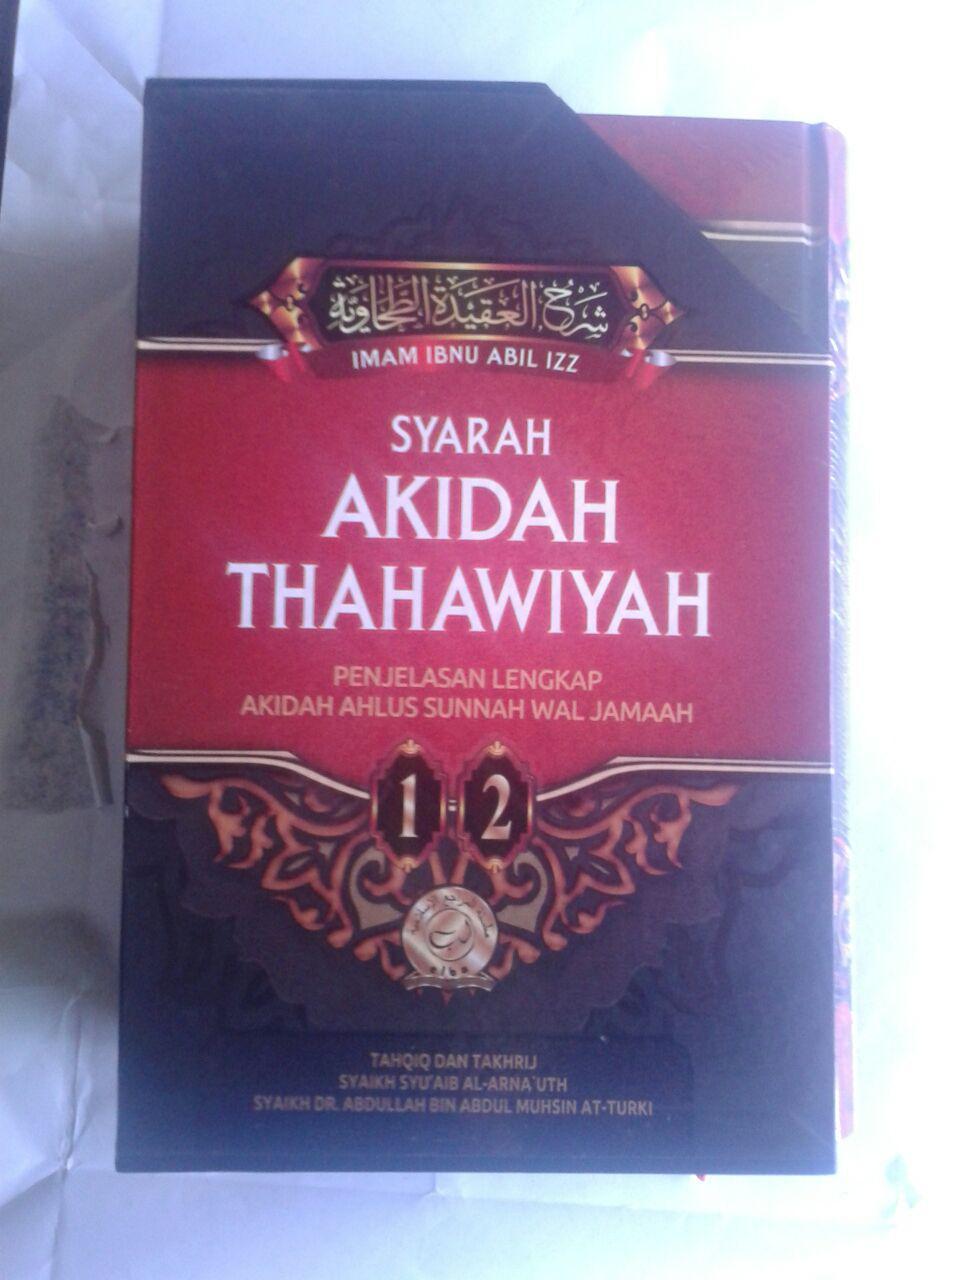 Buku Syarah Akidah Thahawiyah Akidah Ahlussunnah cover 4